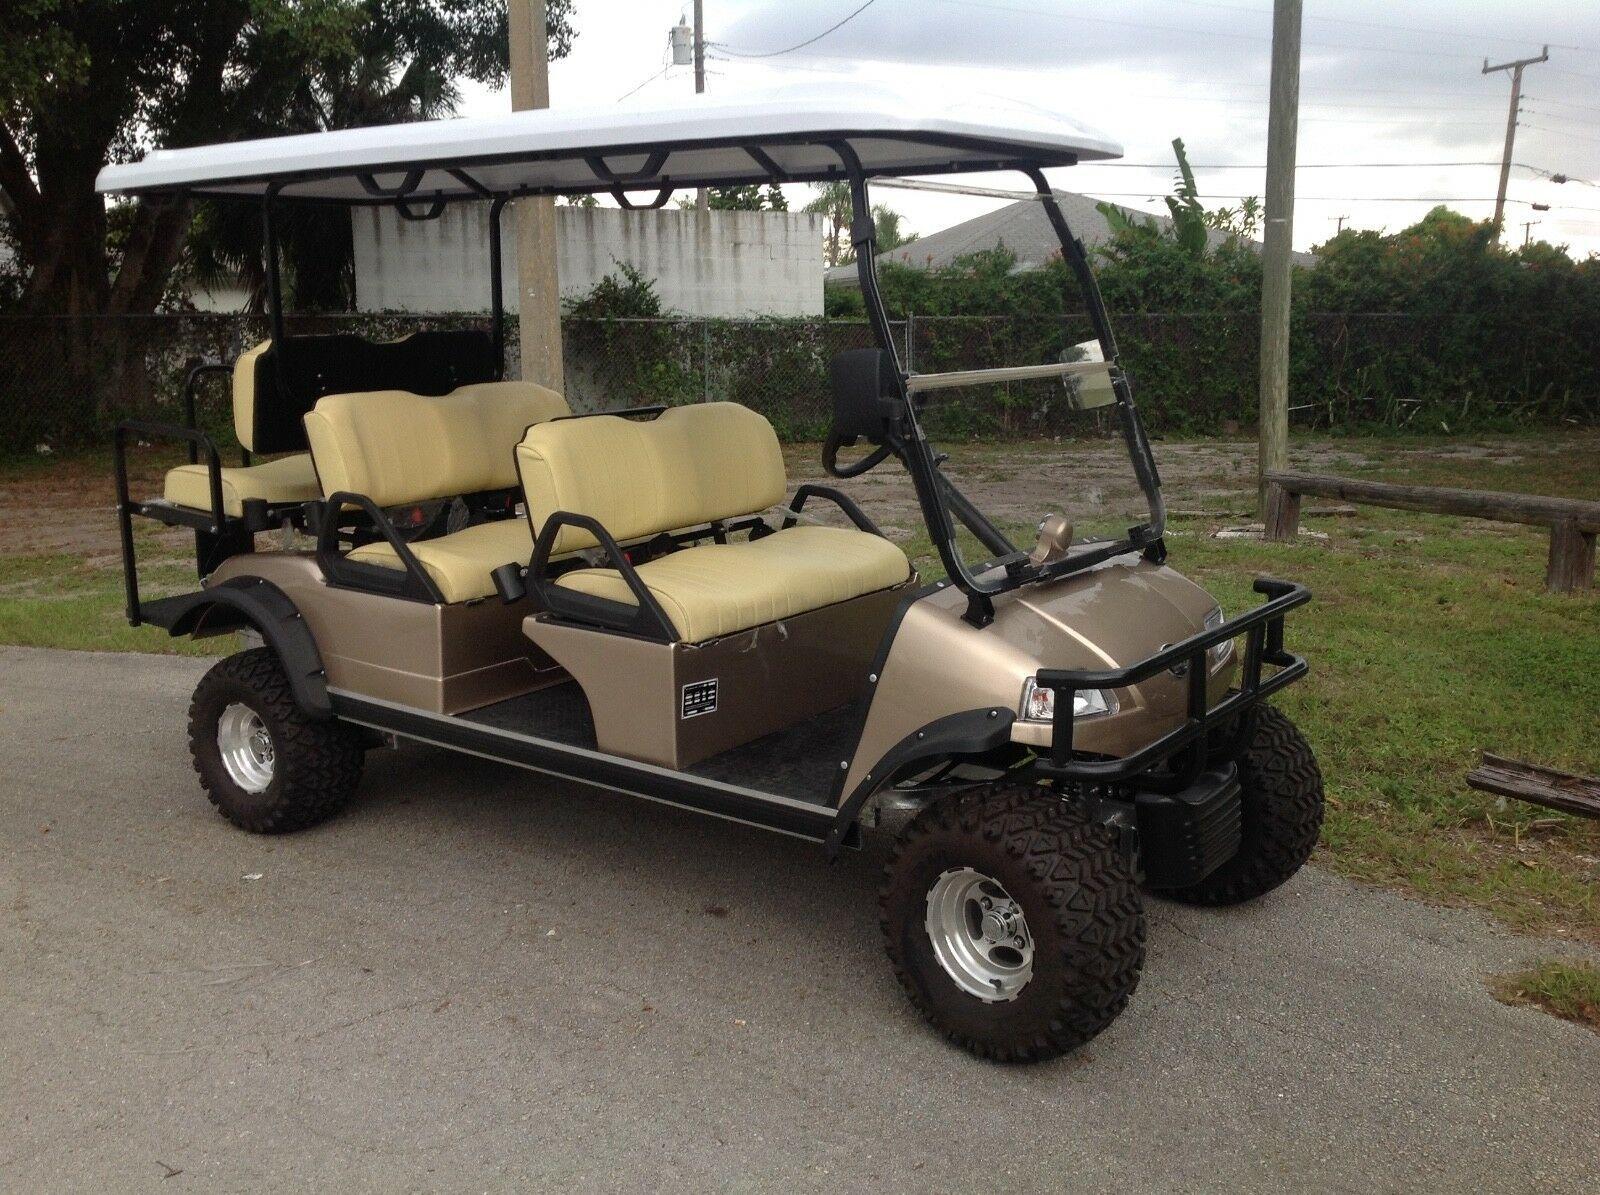 2020 lsv evolution lifted golf cart in 2020 golf cart